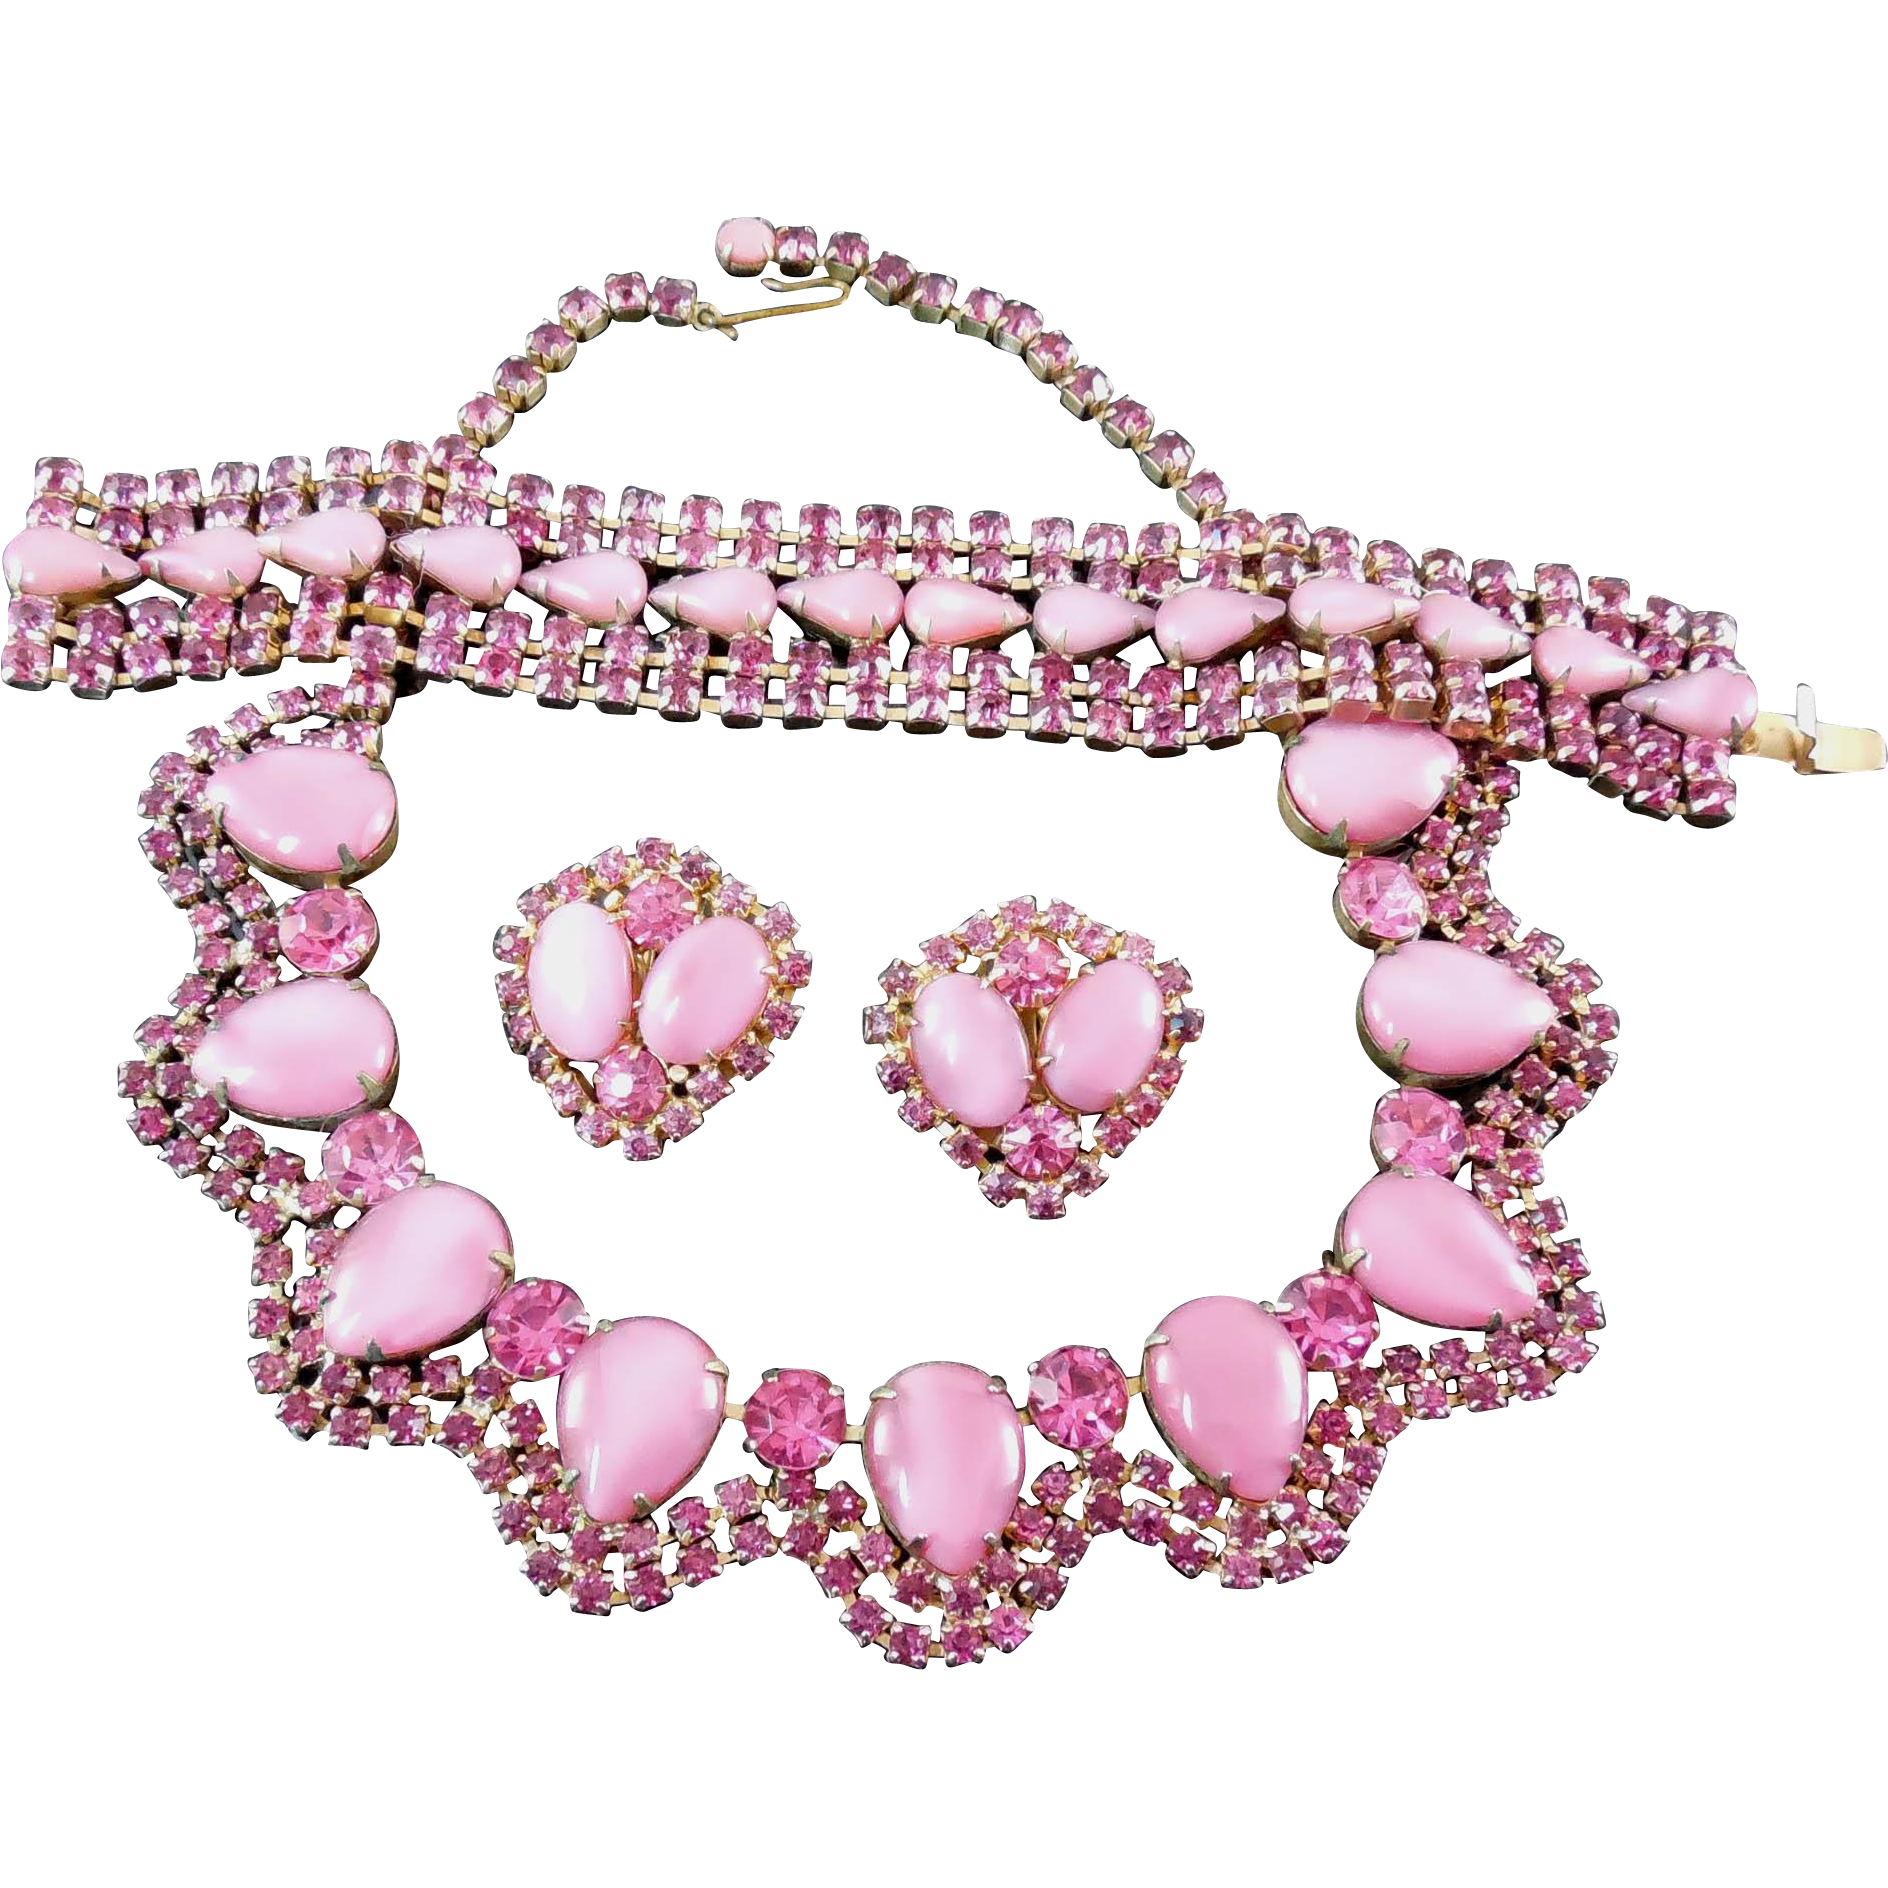 Gorgeous Pink Rhinestone Parure - Unsigned Warner Necklace Bracelet Earrings